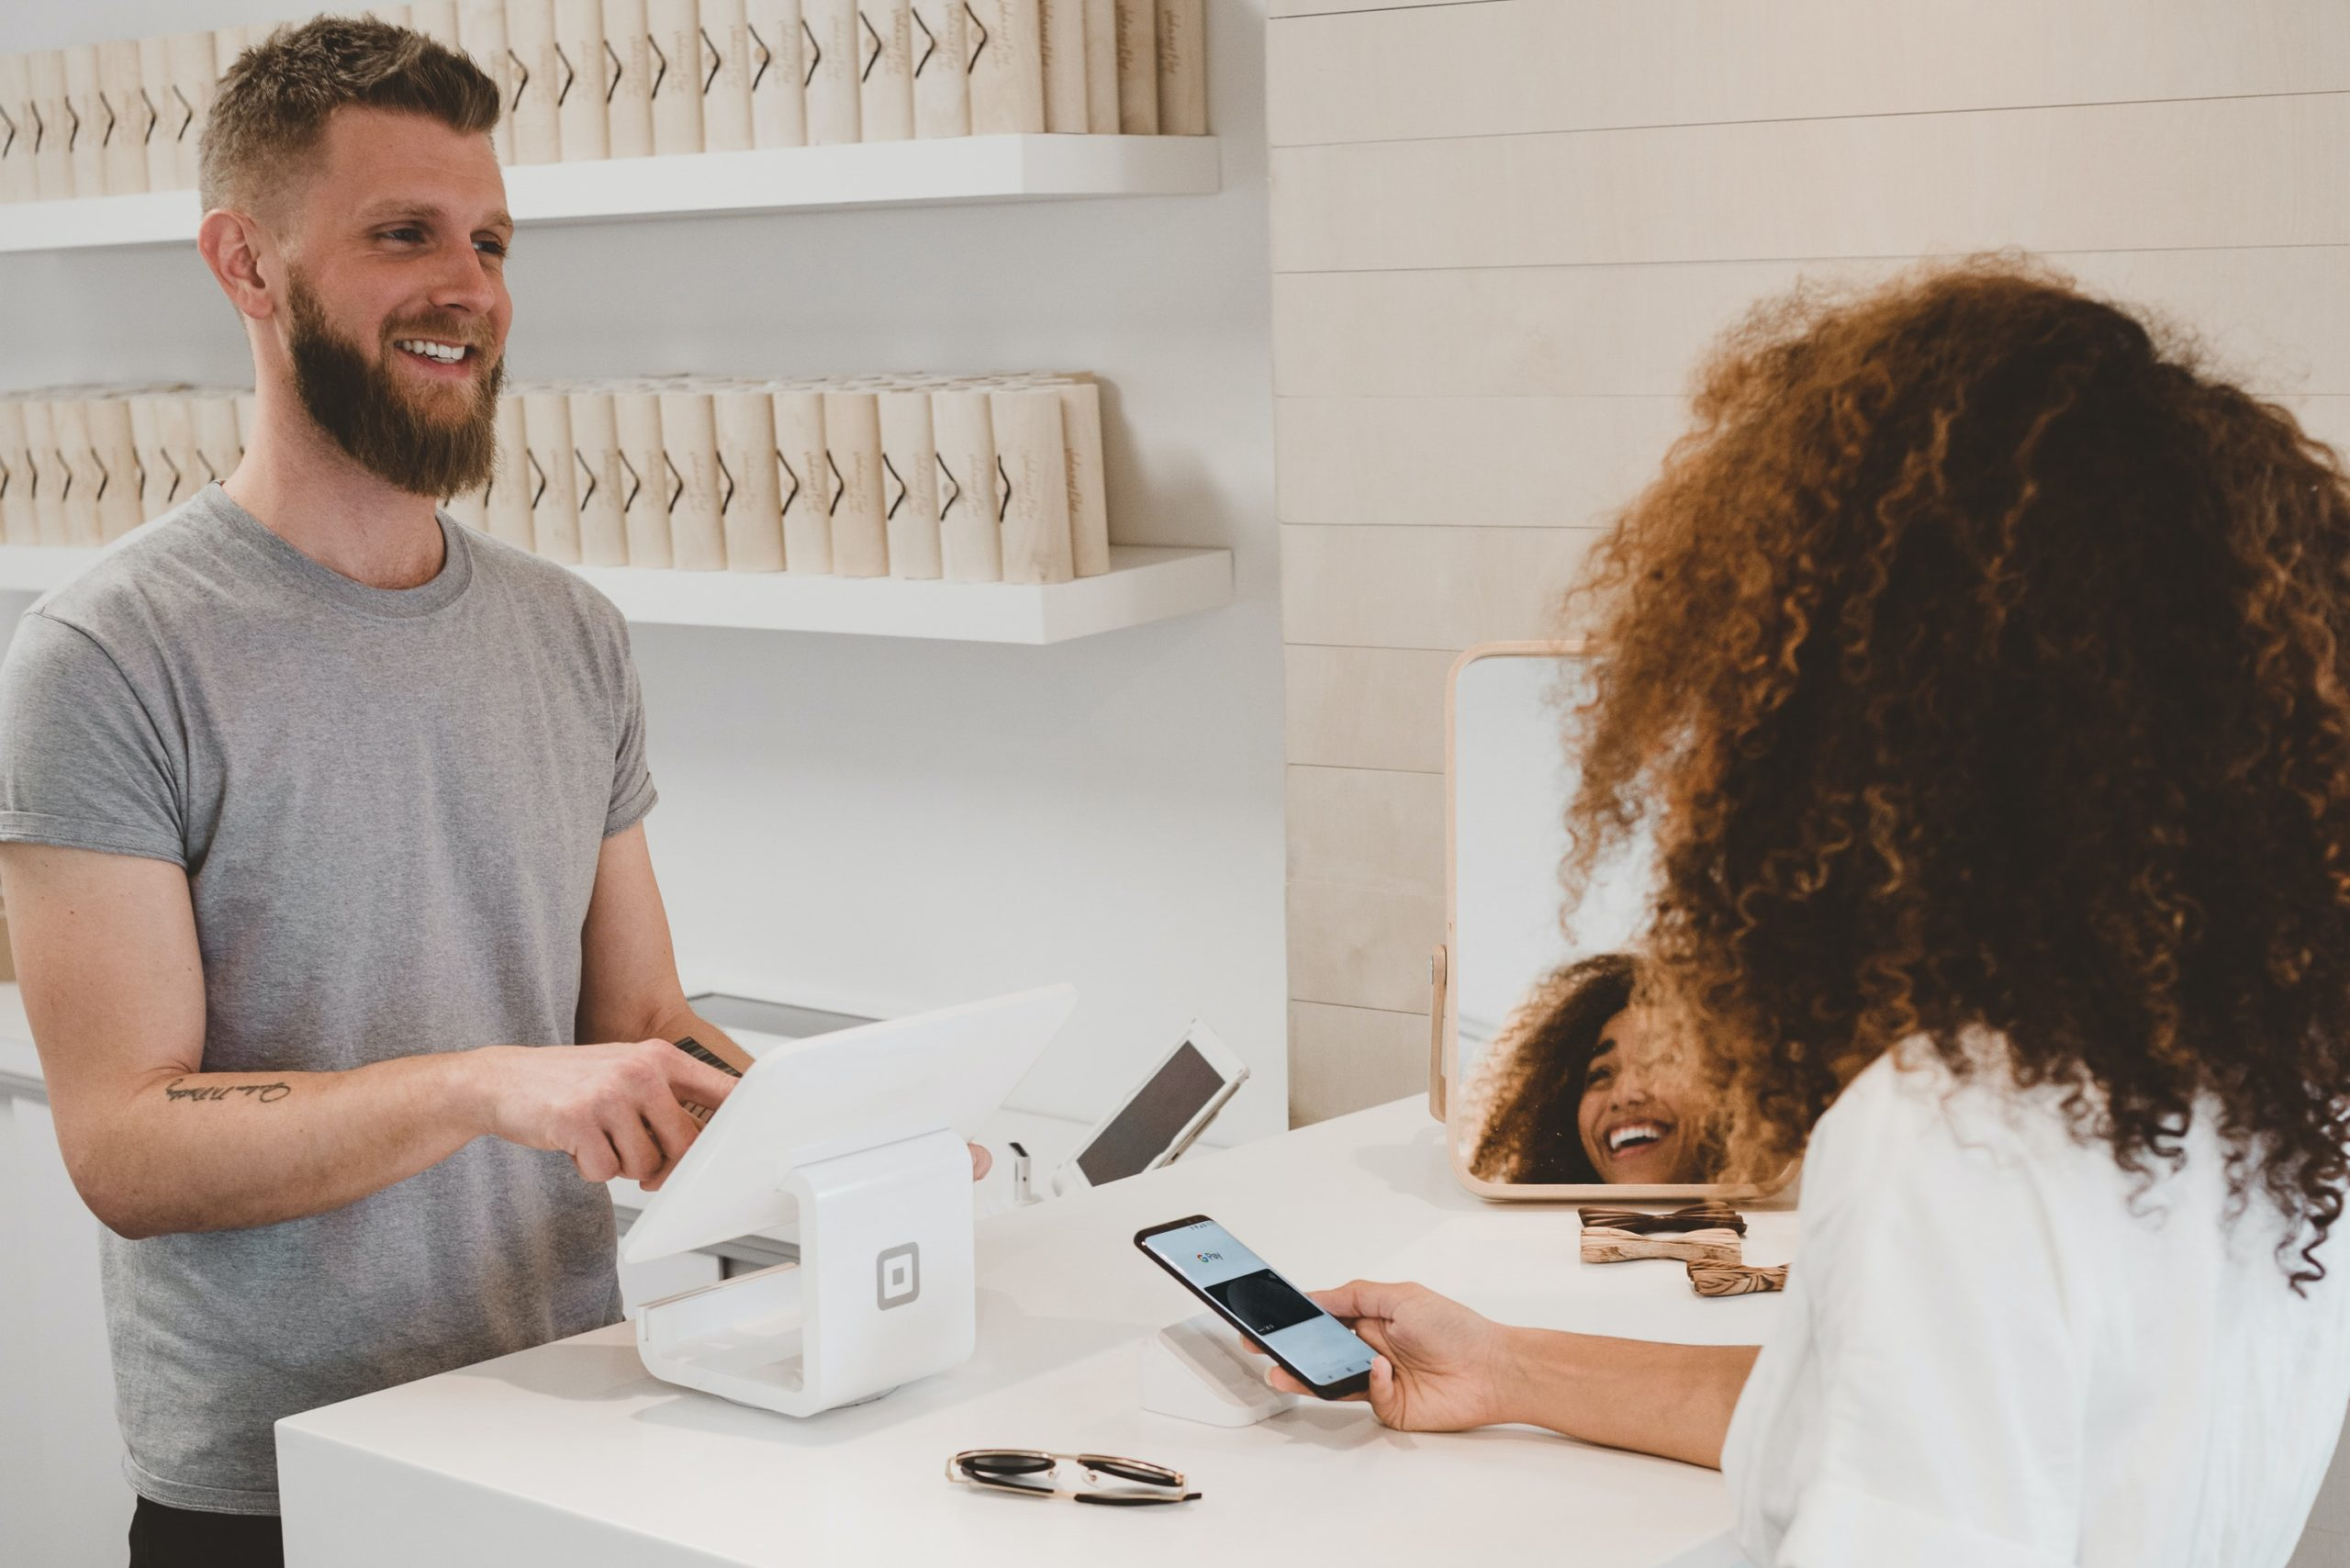 Curso SEPE: Habilidades de comunicación con el cliente para vendedores